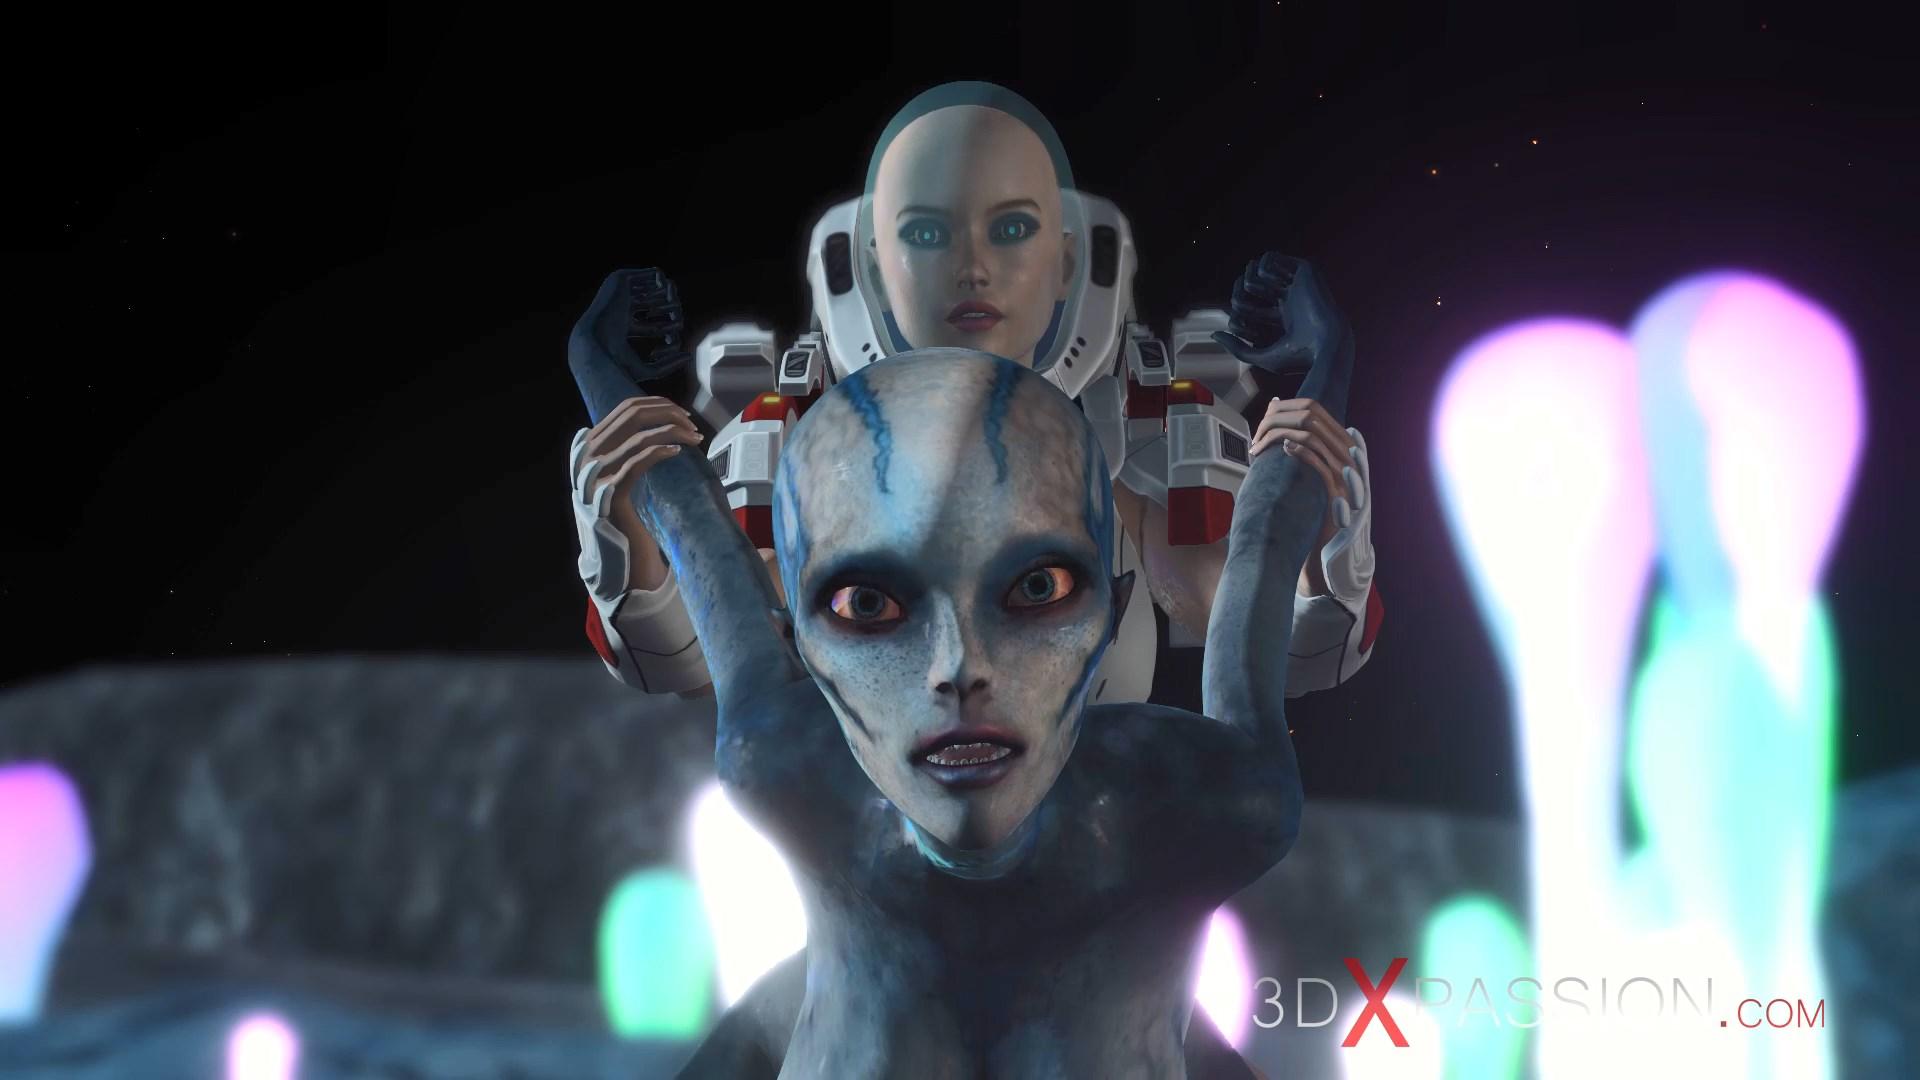 alien fucked spacewoman spacesuit strapon exoplanet sci-fi